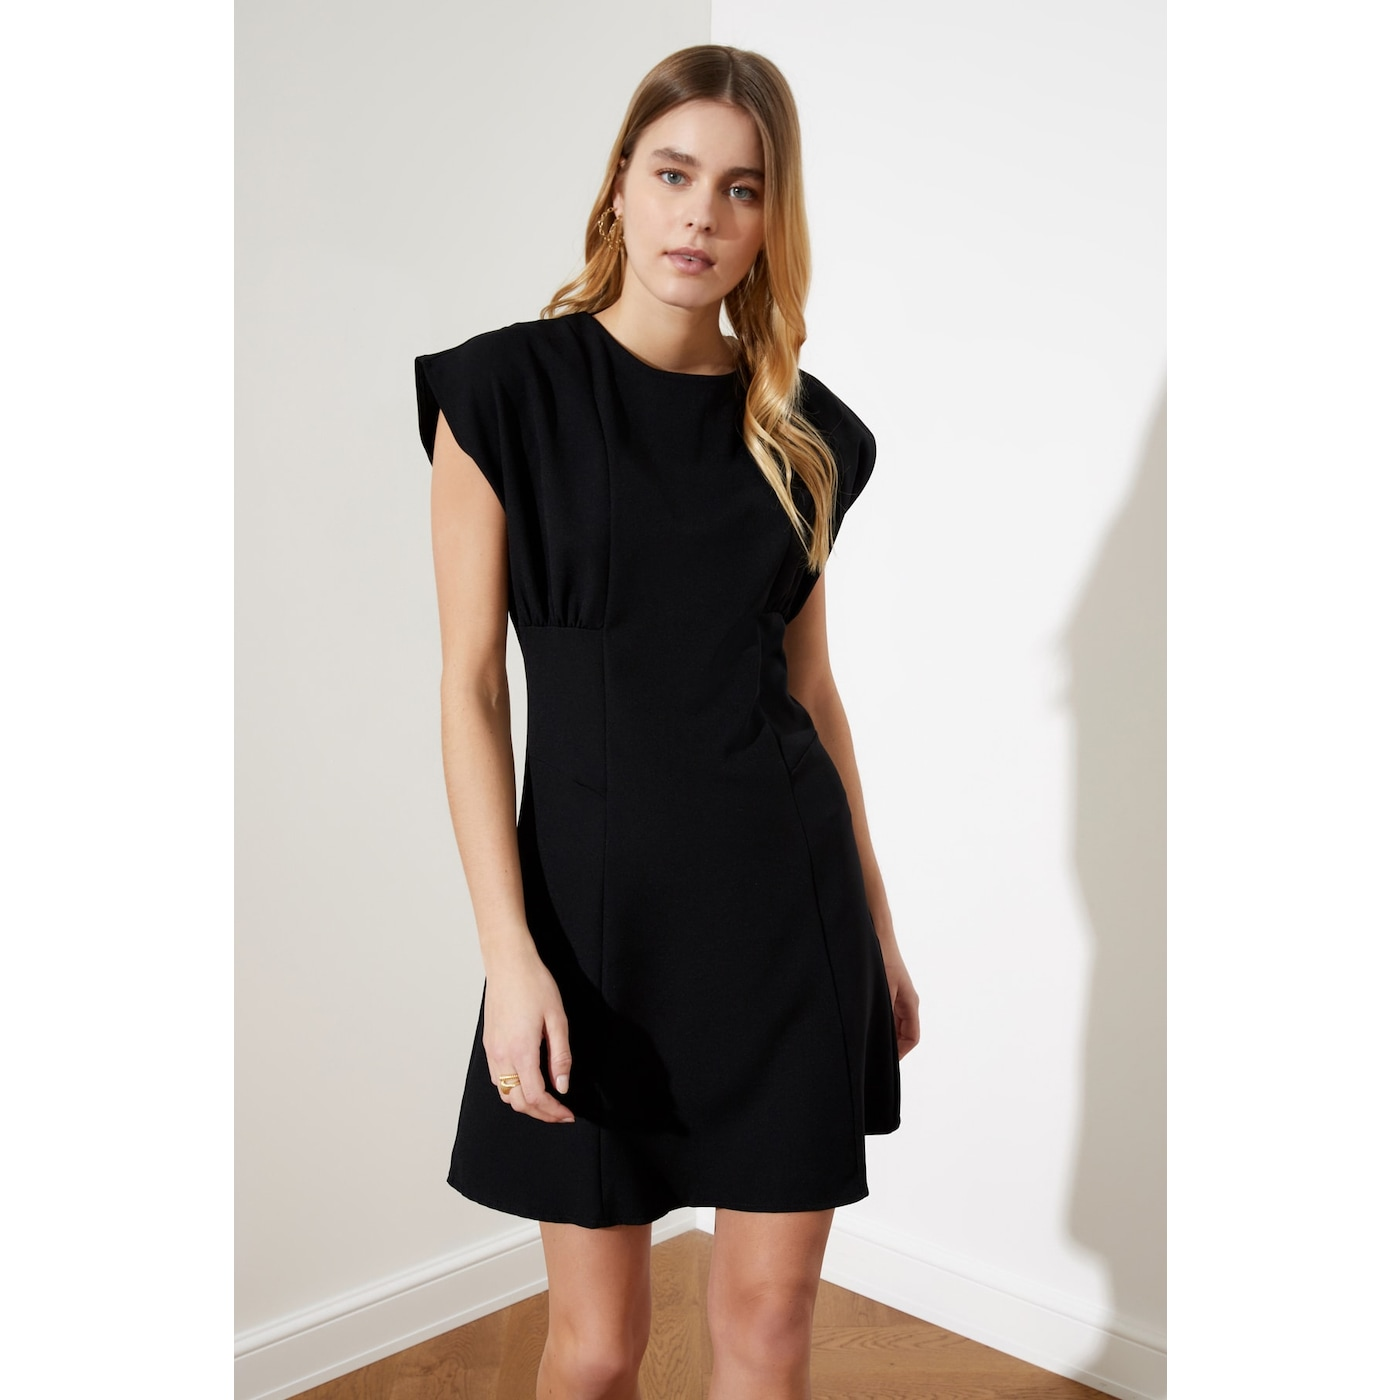 Trendyol Black Assk Detail Dress dámské 36